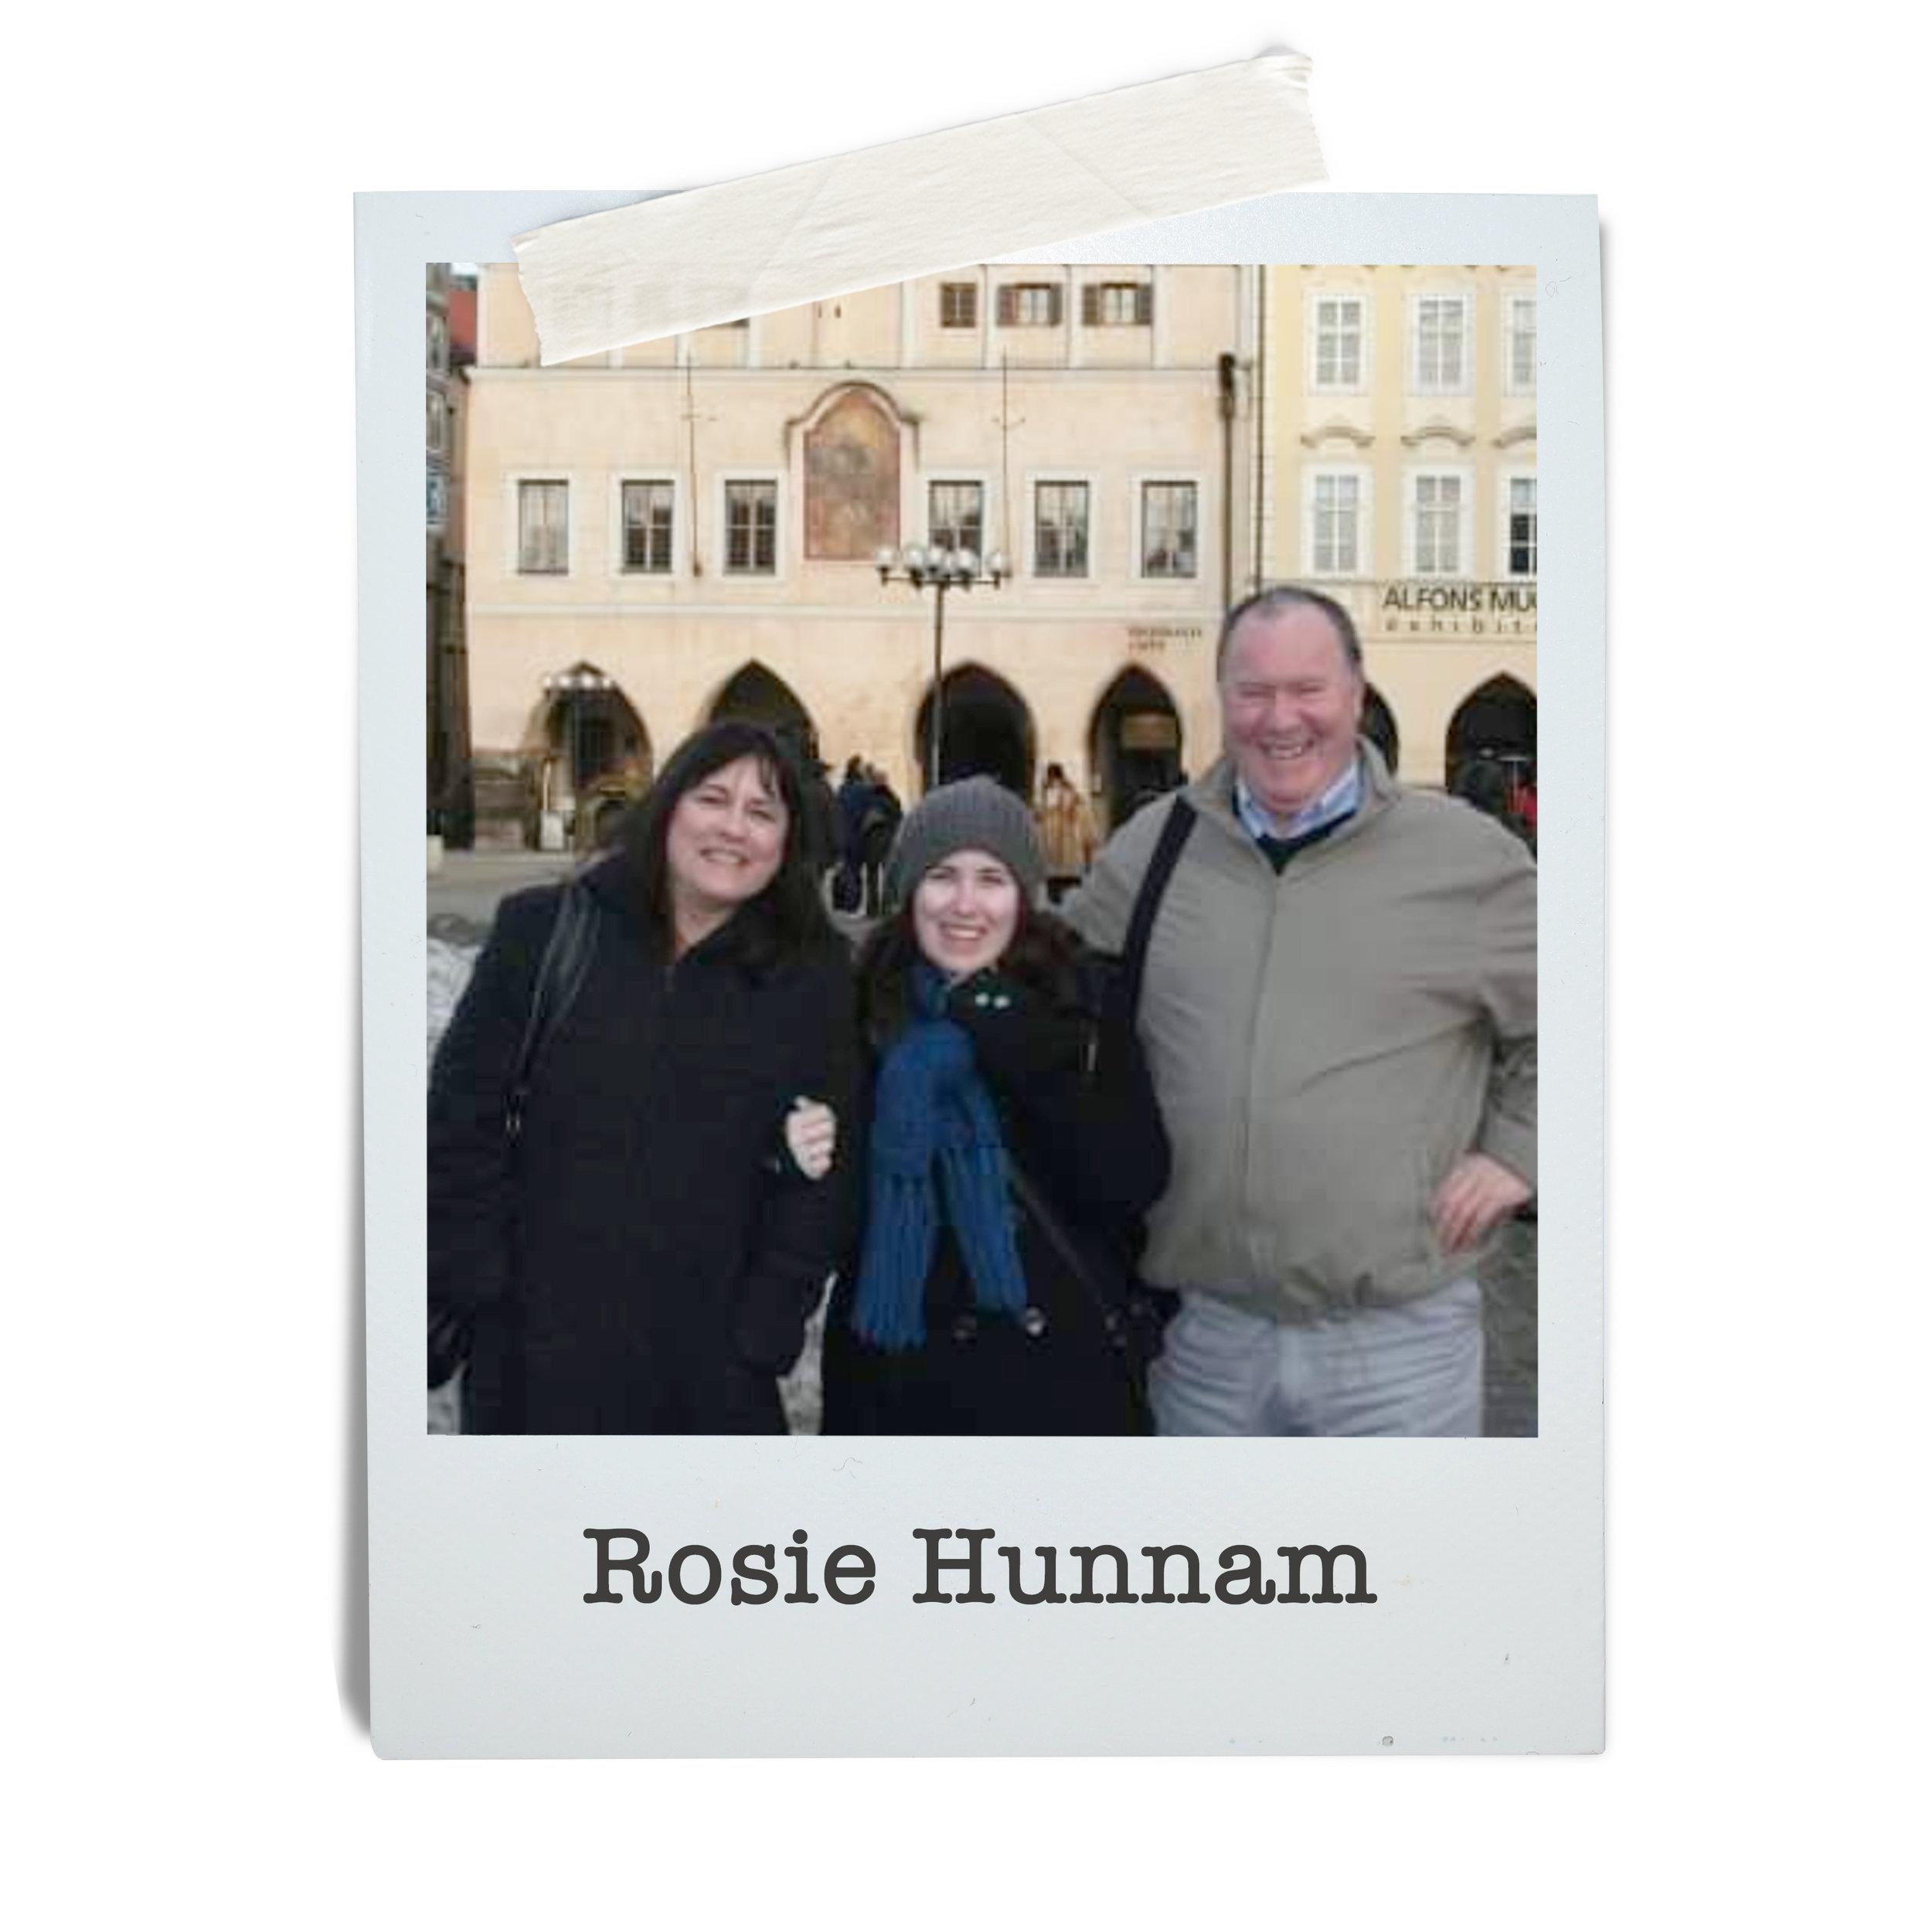 Rosie Hunnam